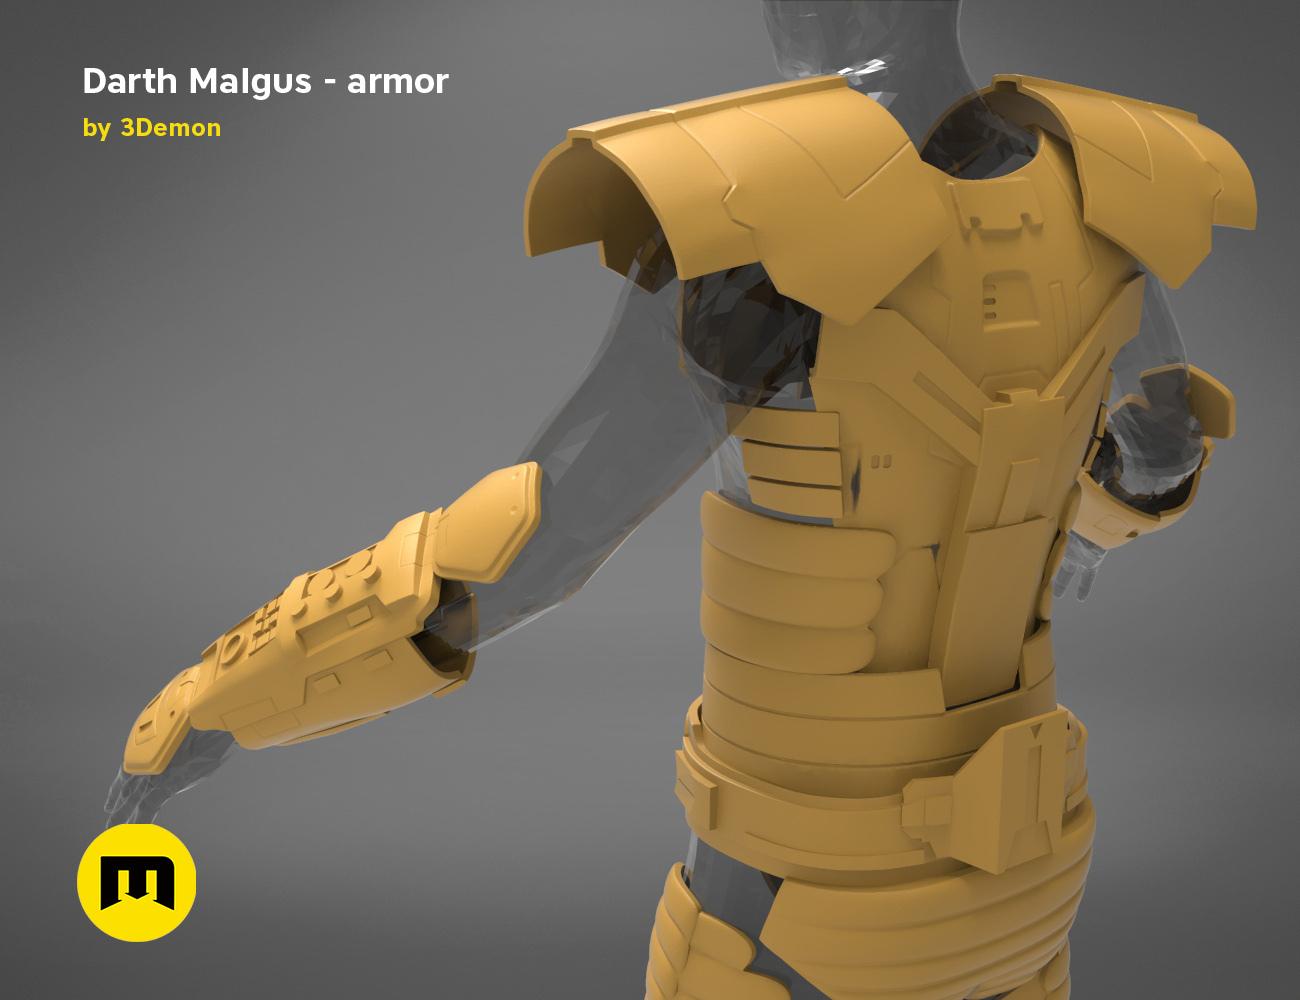 Darth-Malgus-armor-render_scene_basic.104 kopie.jpg Download STL file Darth Malgus's full size armor • Design to 3D print, 3D-mon